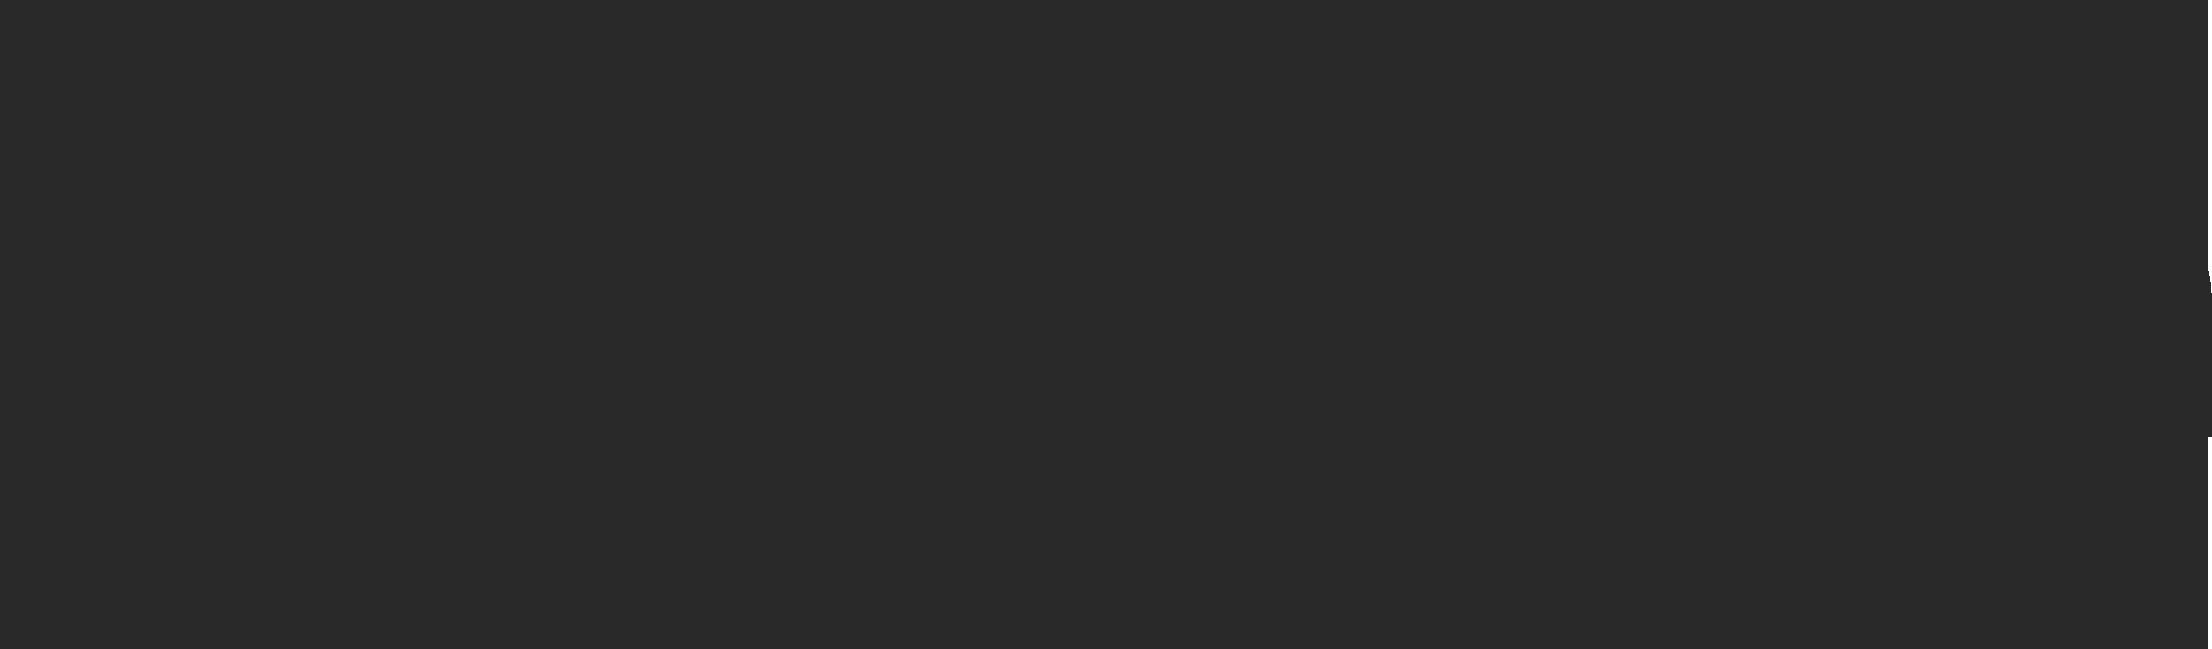 2018sf_Datarama_a_Salesforce_Company_Logo_KO_V1 copy-1